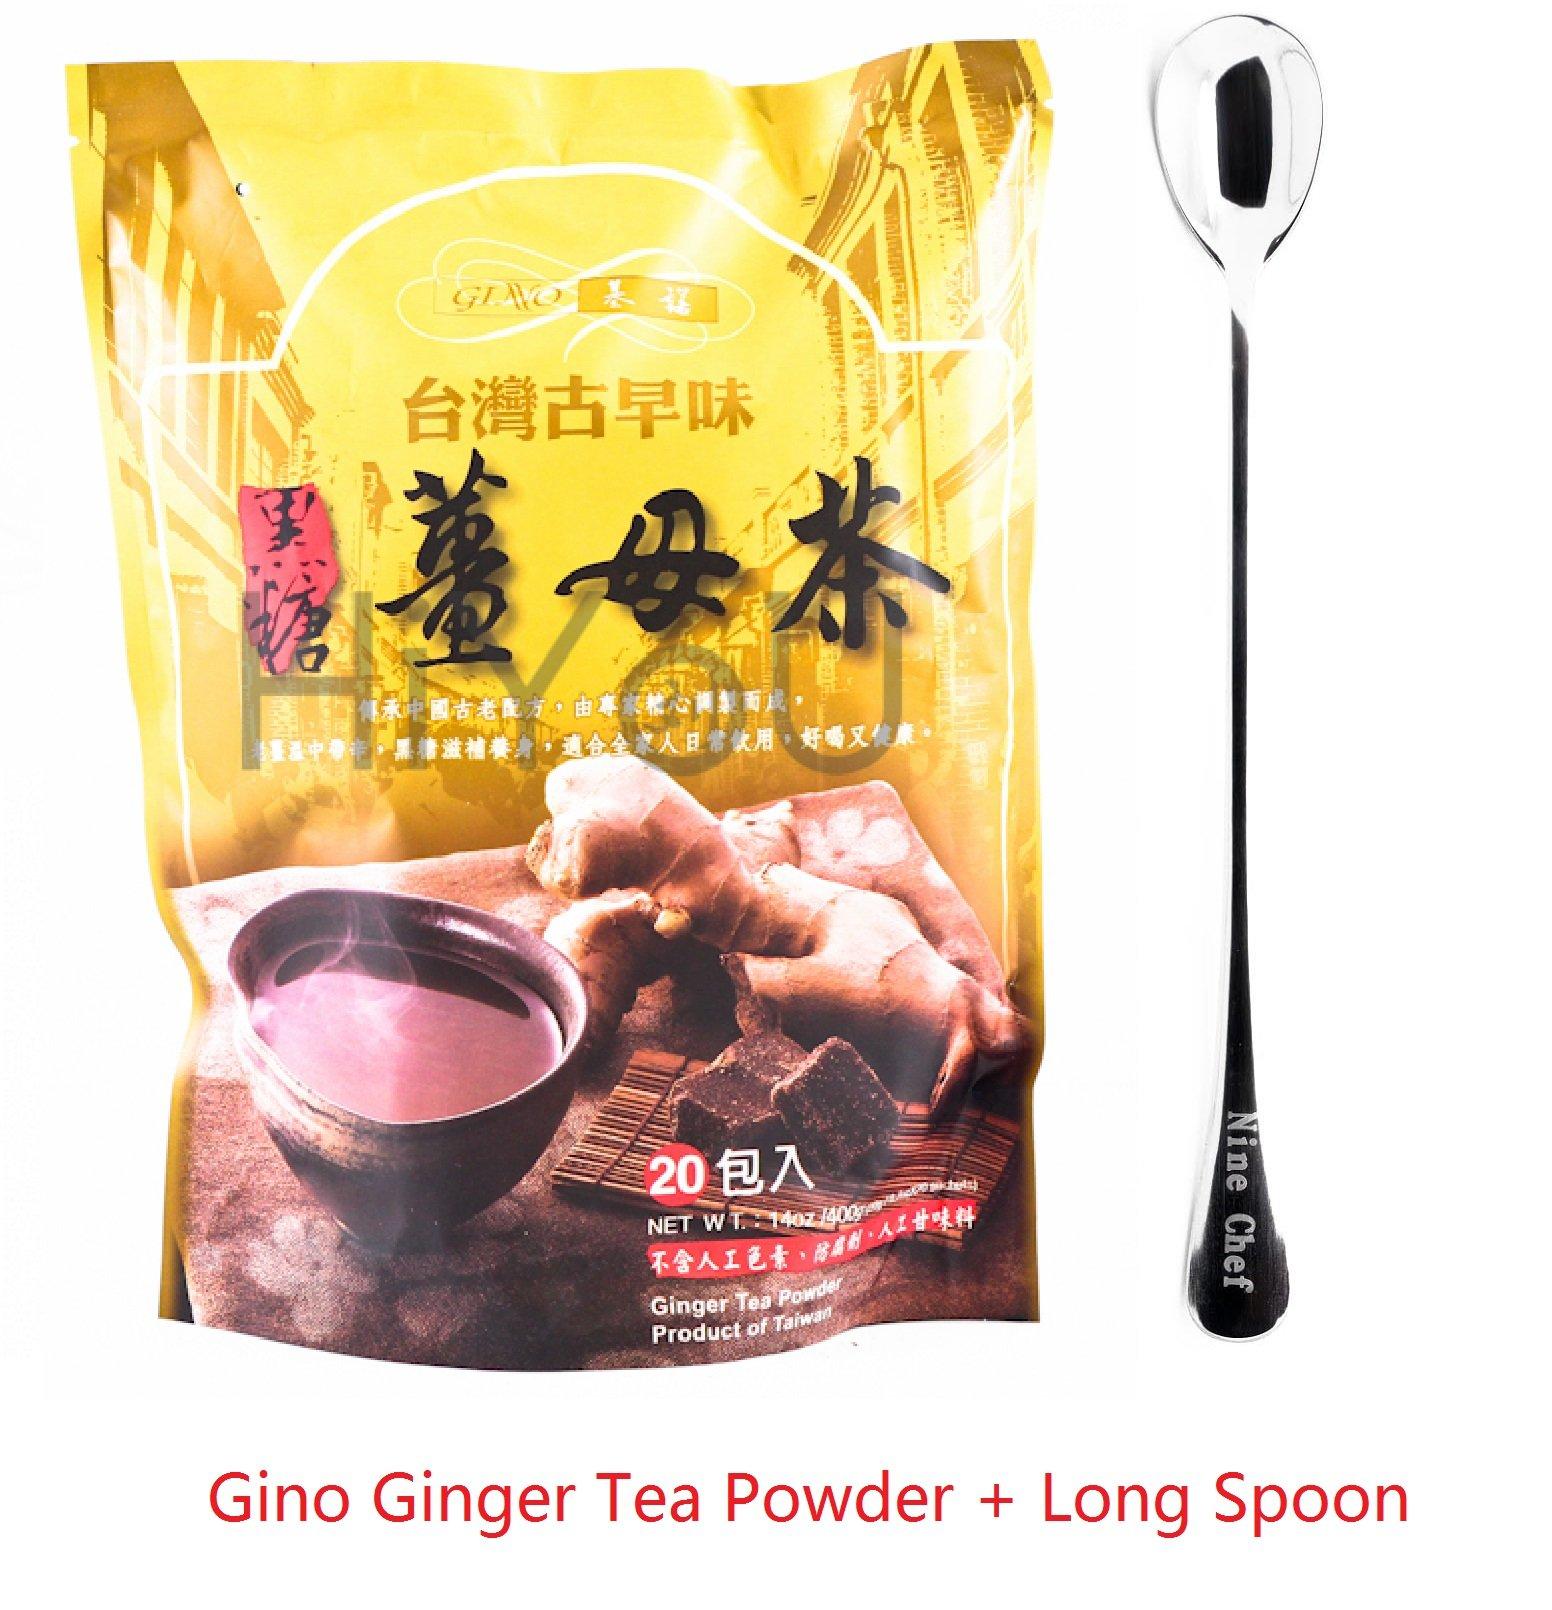 Gino Cafe Ginger Tea Powder(10 Bag) + One NineChef Coffee Spoon